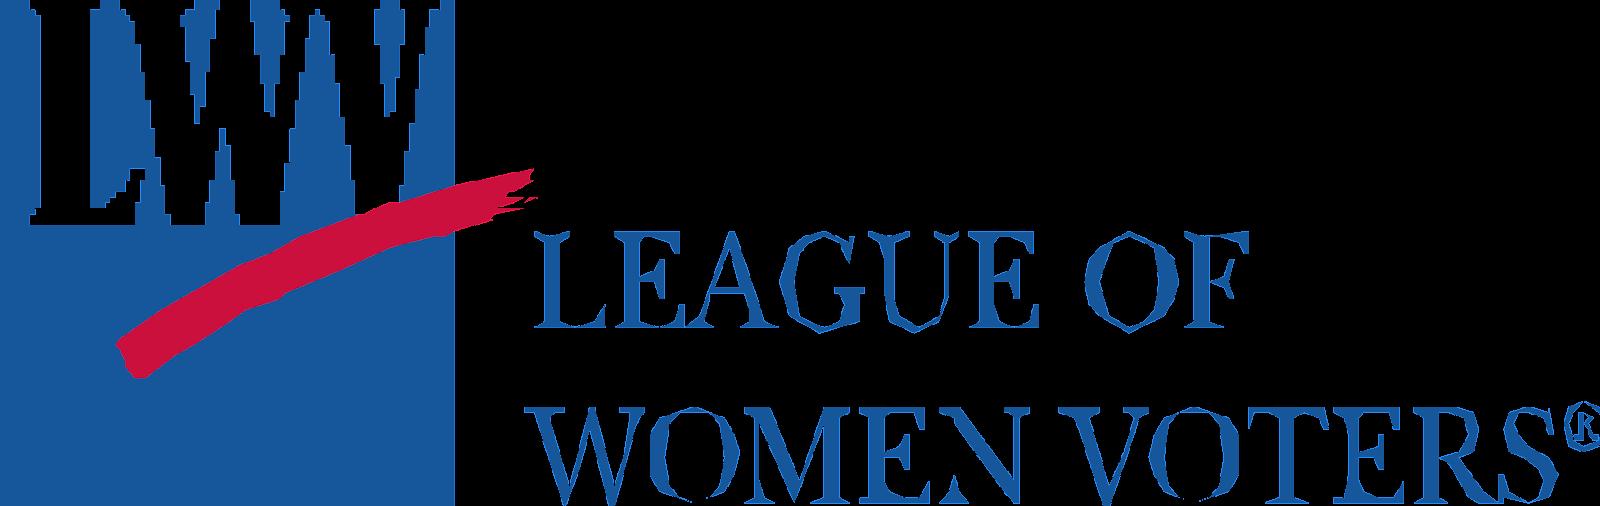 League logo, standard